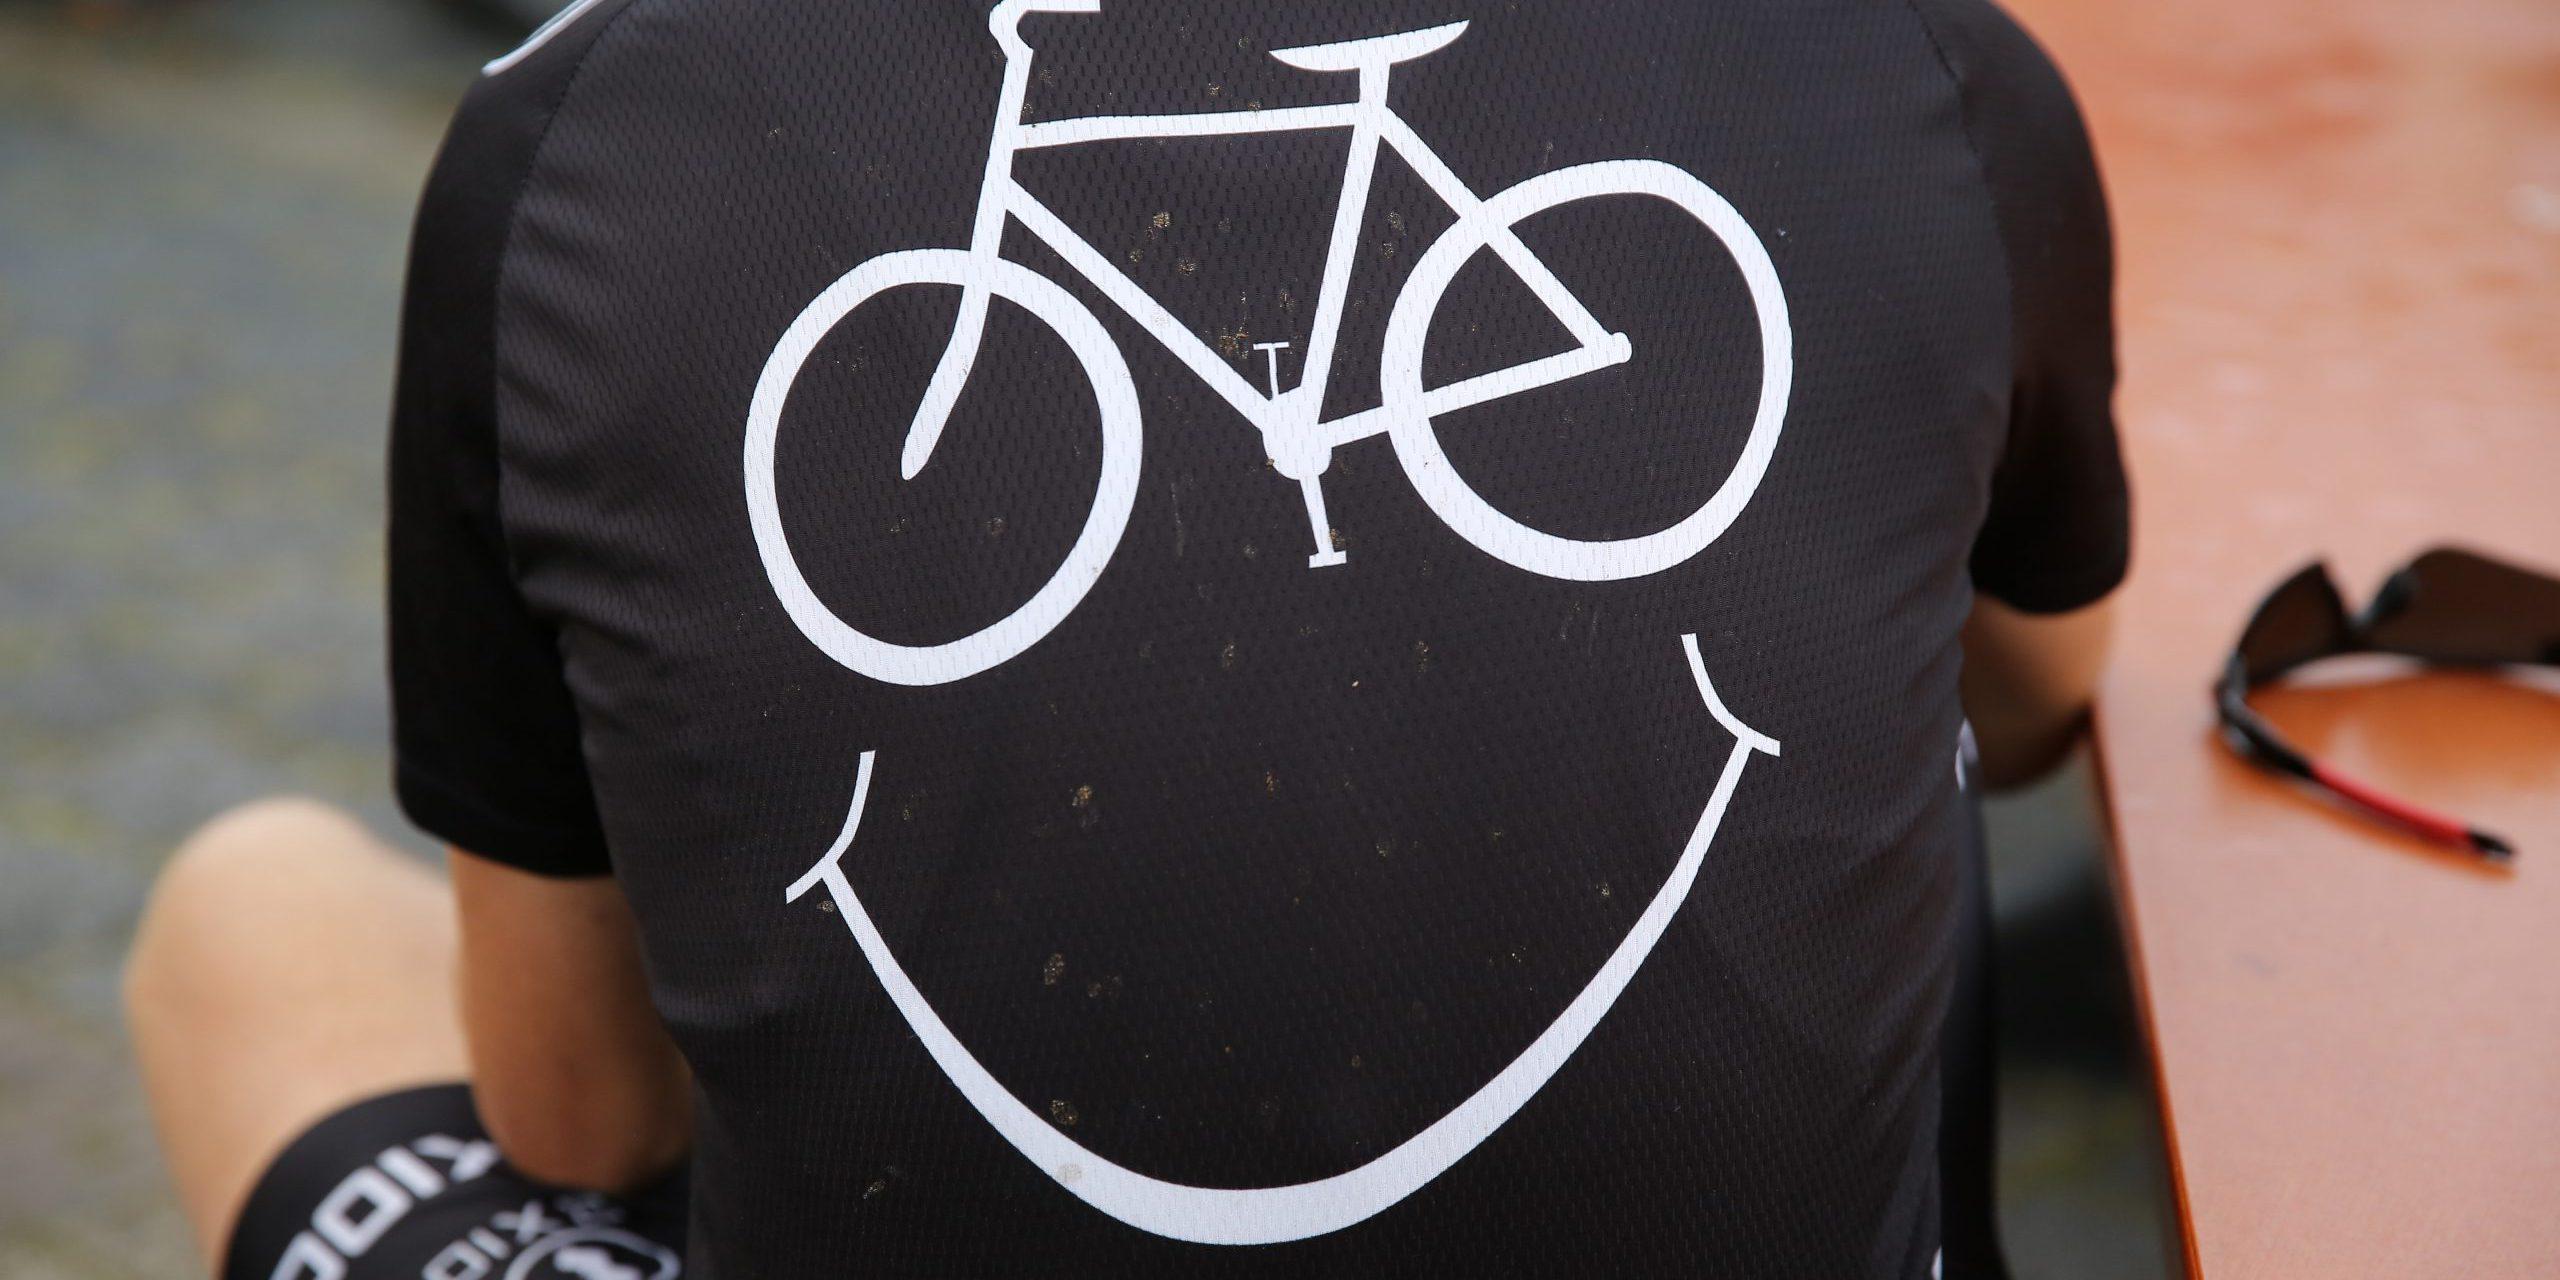 Smiley Bike